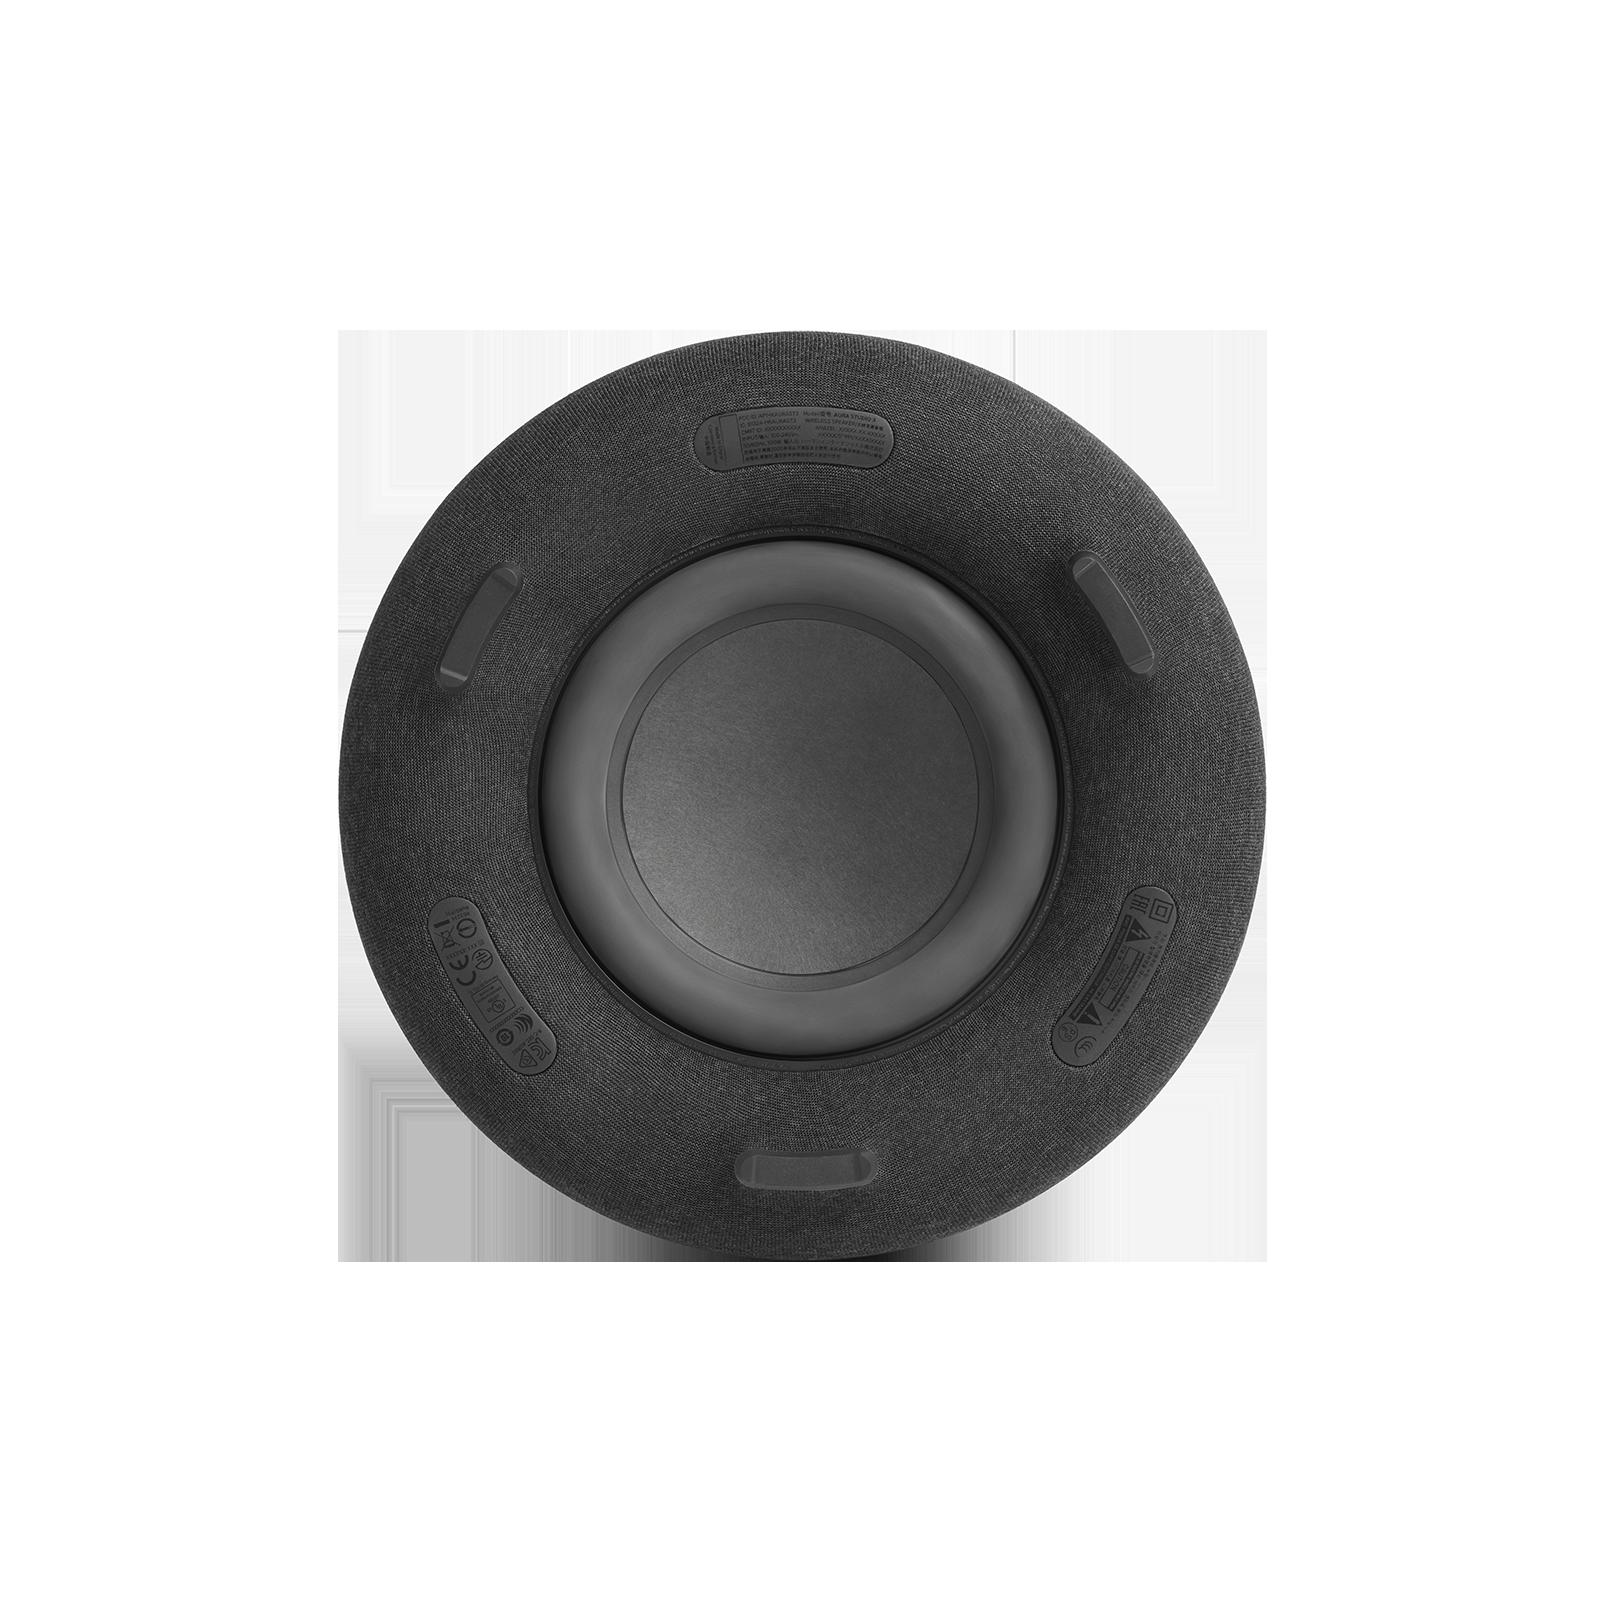 Aura Studio 3 - Black - Bluetooth speaker - Detailshot 2